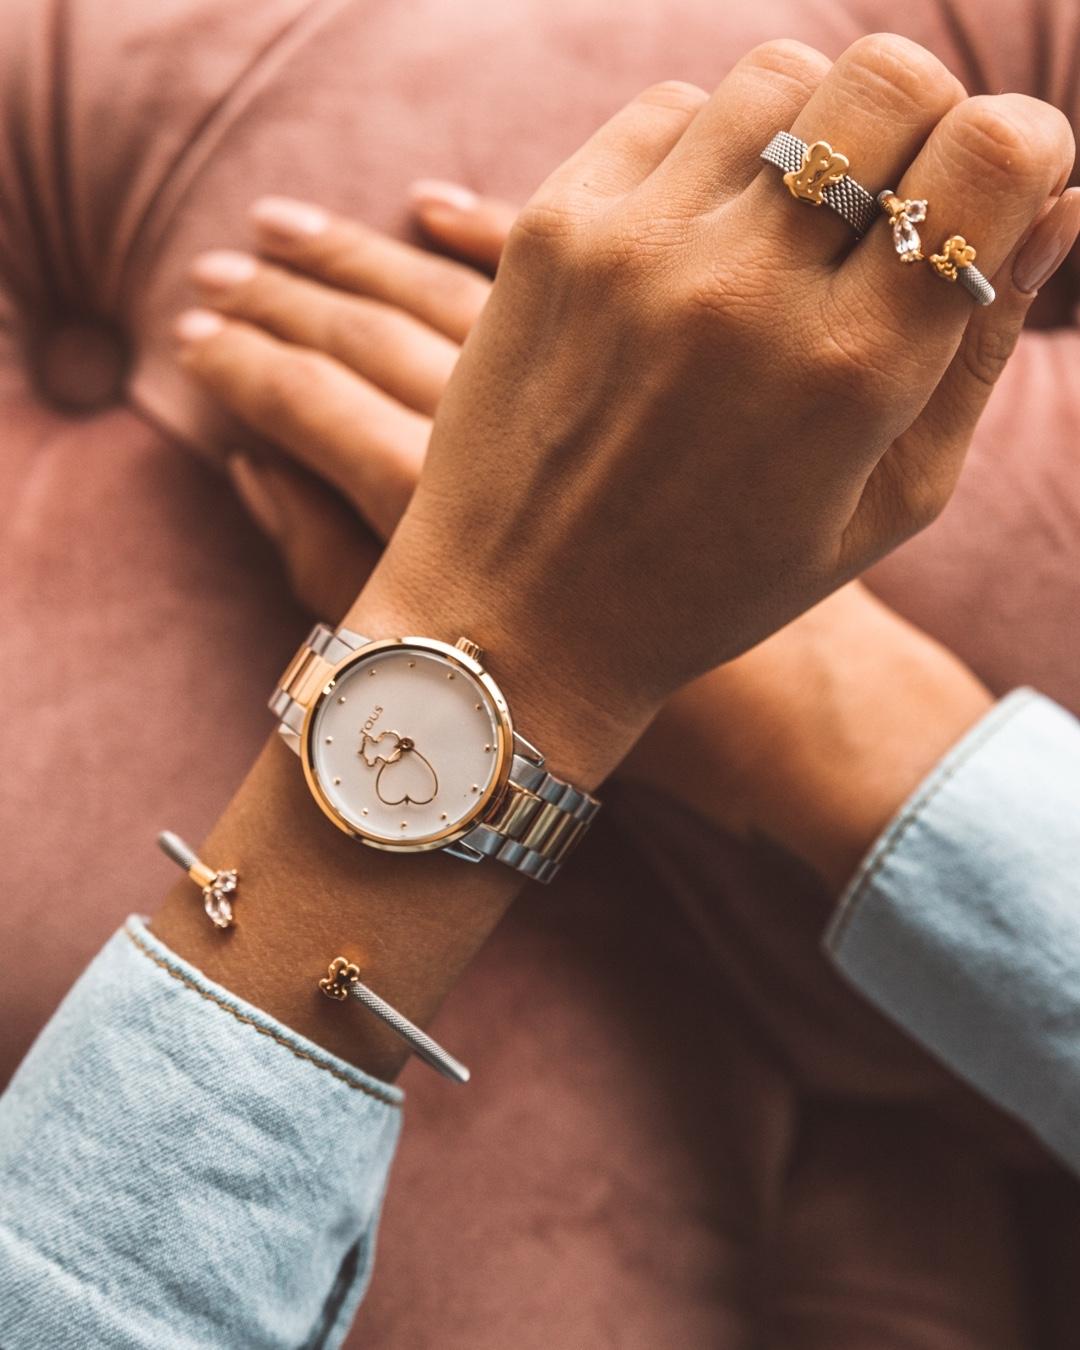 watch design Tous watch worn on wrist with a gold bracelet